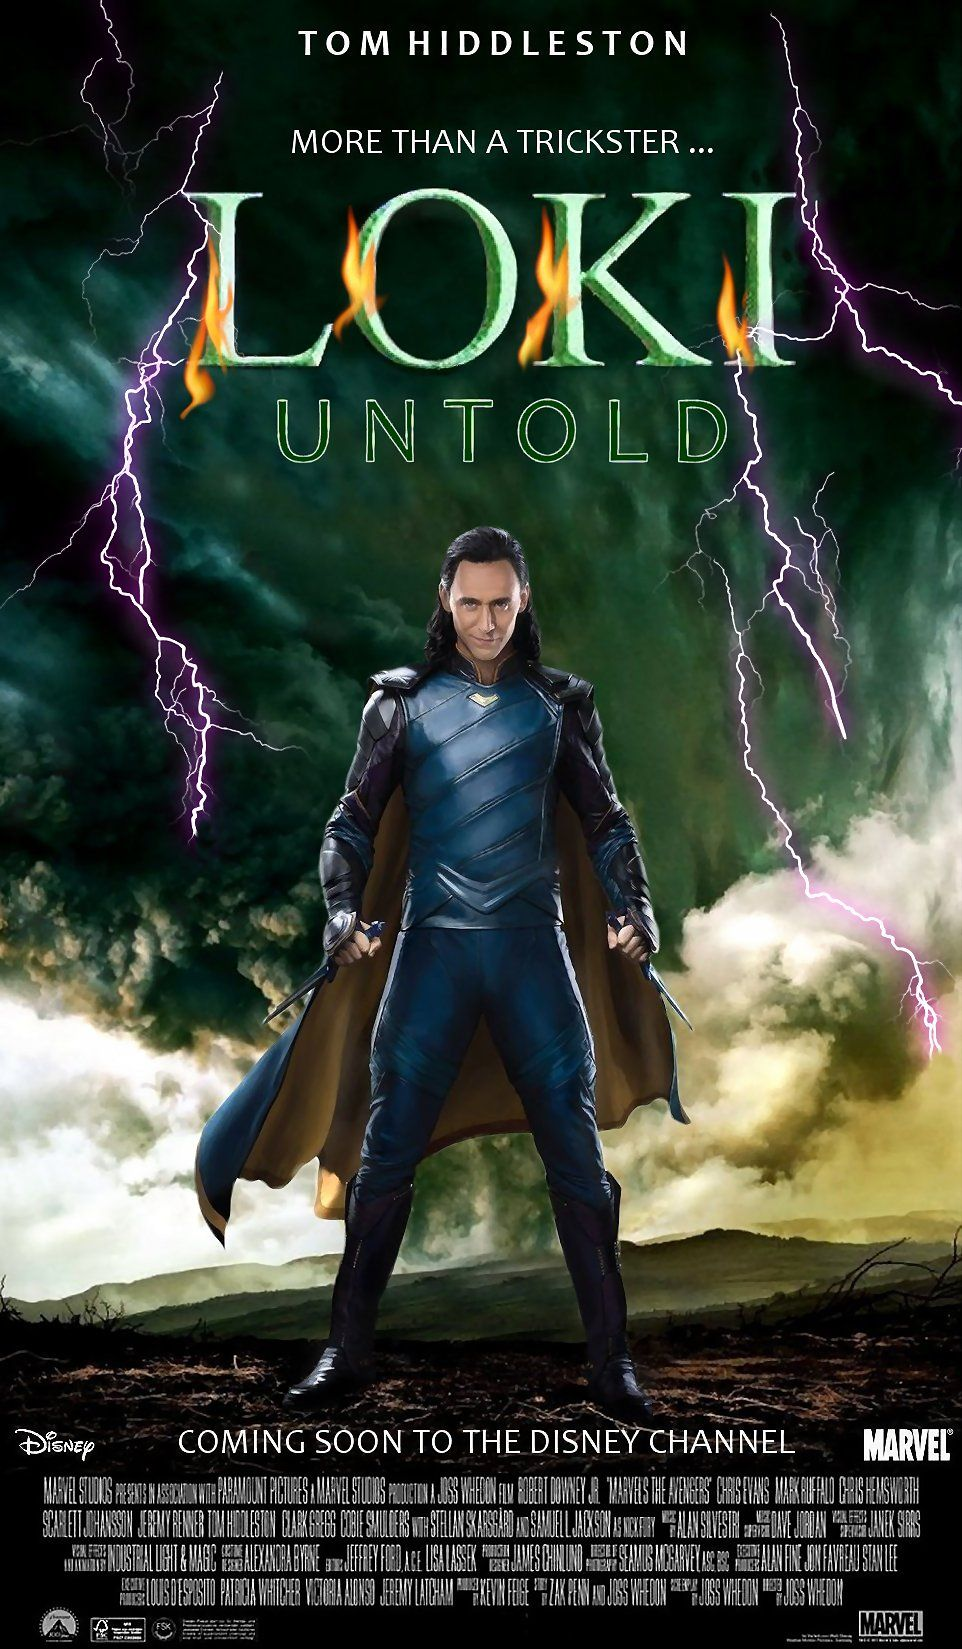 Loki TV series Spoof Poster by me - September 2018 #Loki ...